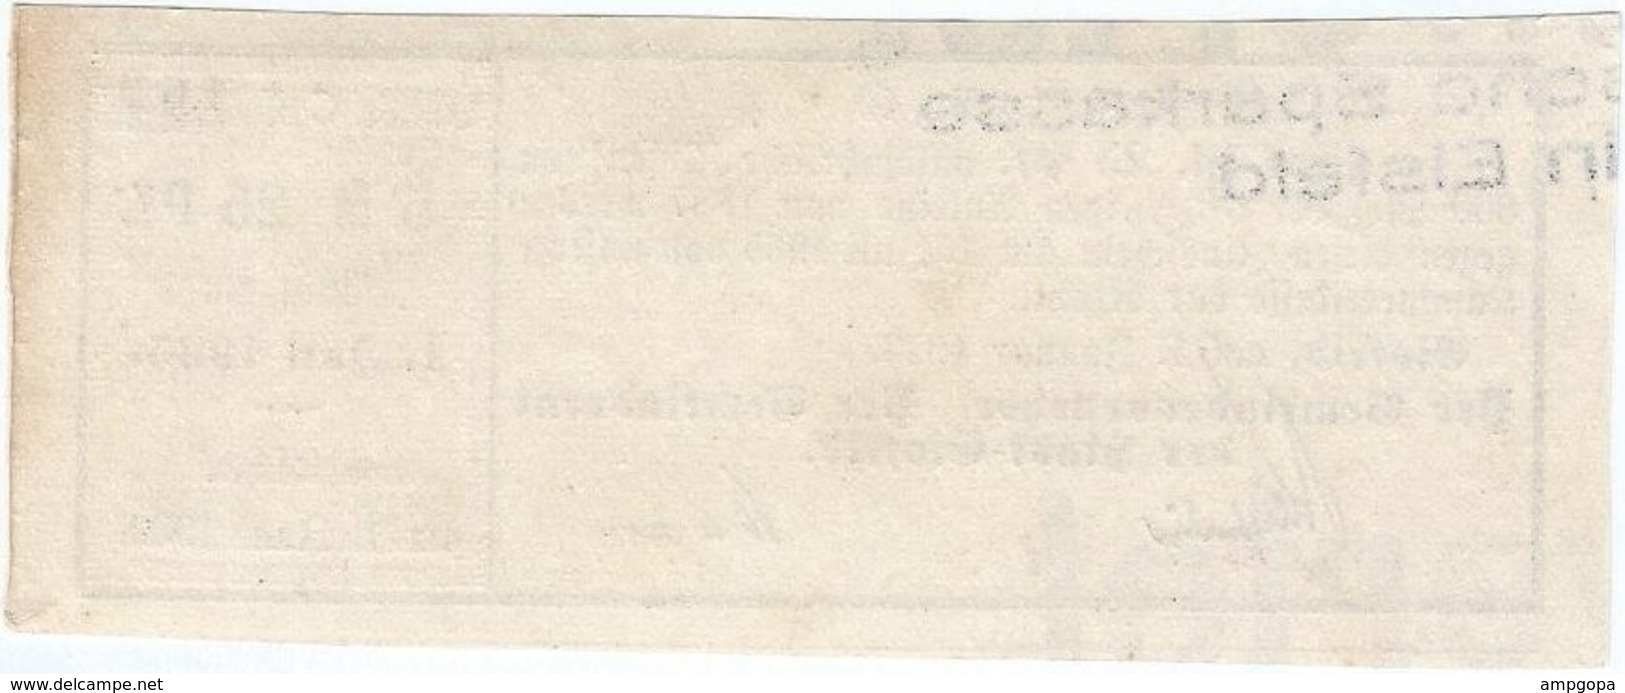 Alemania (BONOS) - Germany 5.25 Mark 1-1-1923 Eisfeld Ref 21 - [ 3] 1918-1933 : Weimar Republic